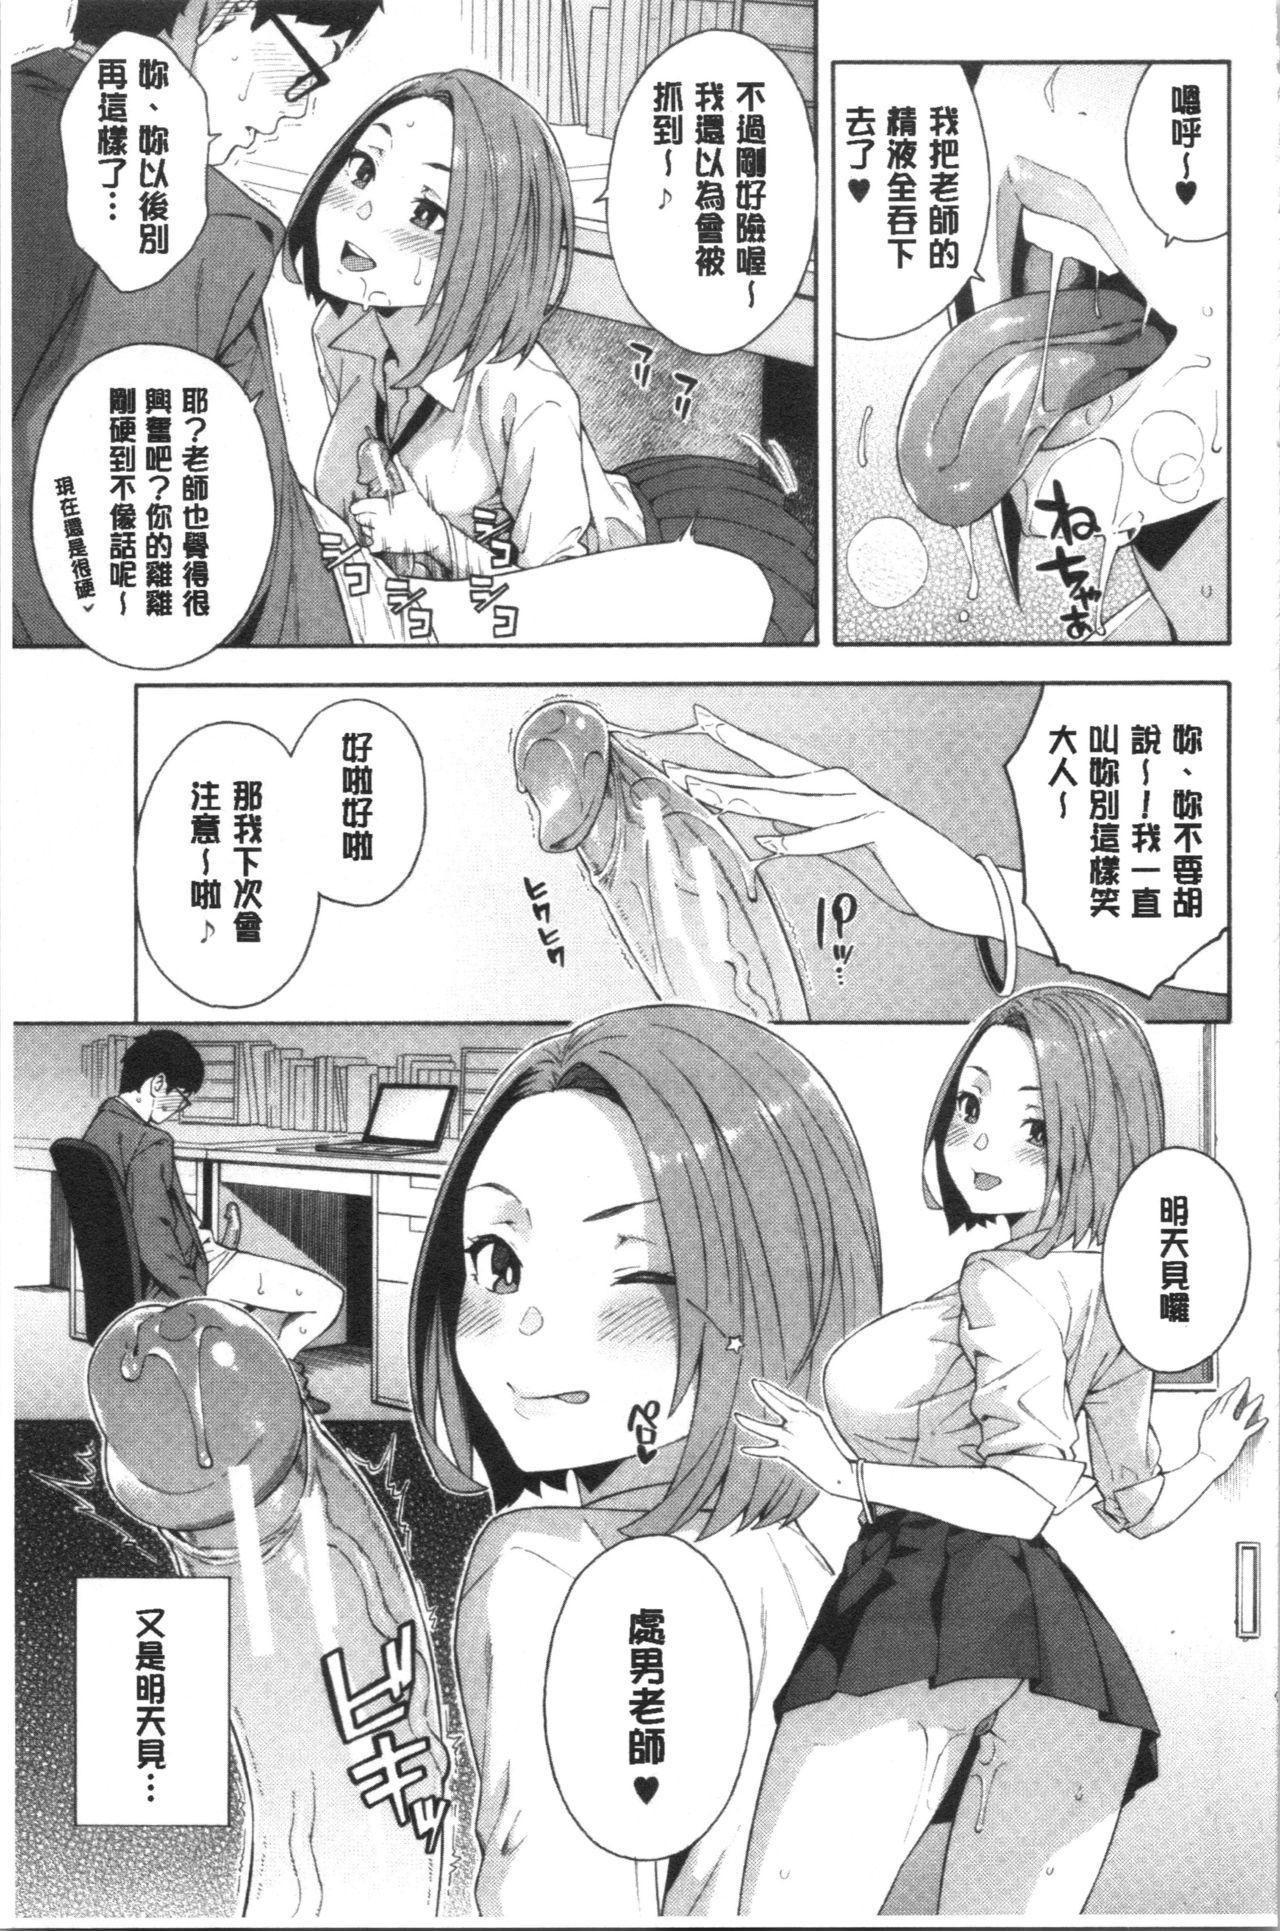 Okashite Ageru | 讓你來侵犯我 21